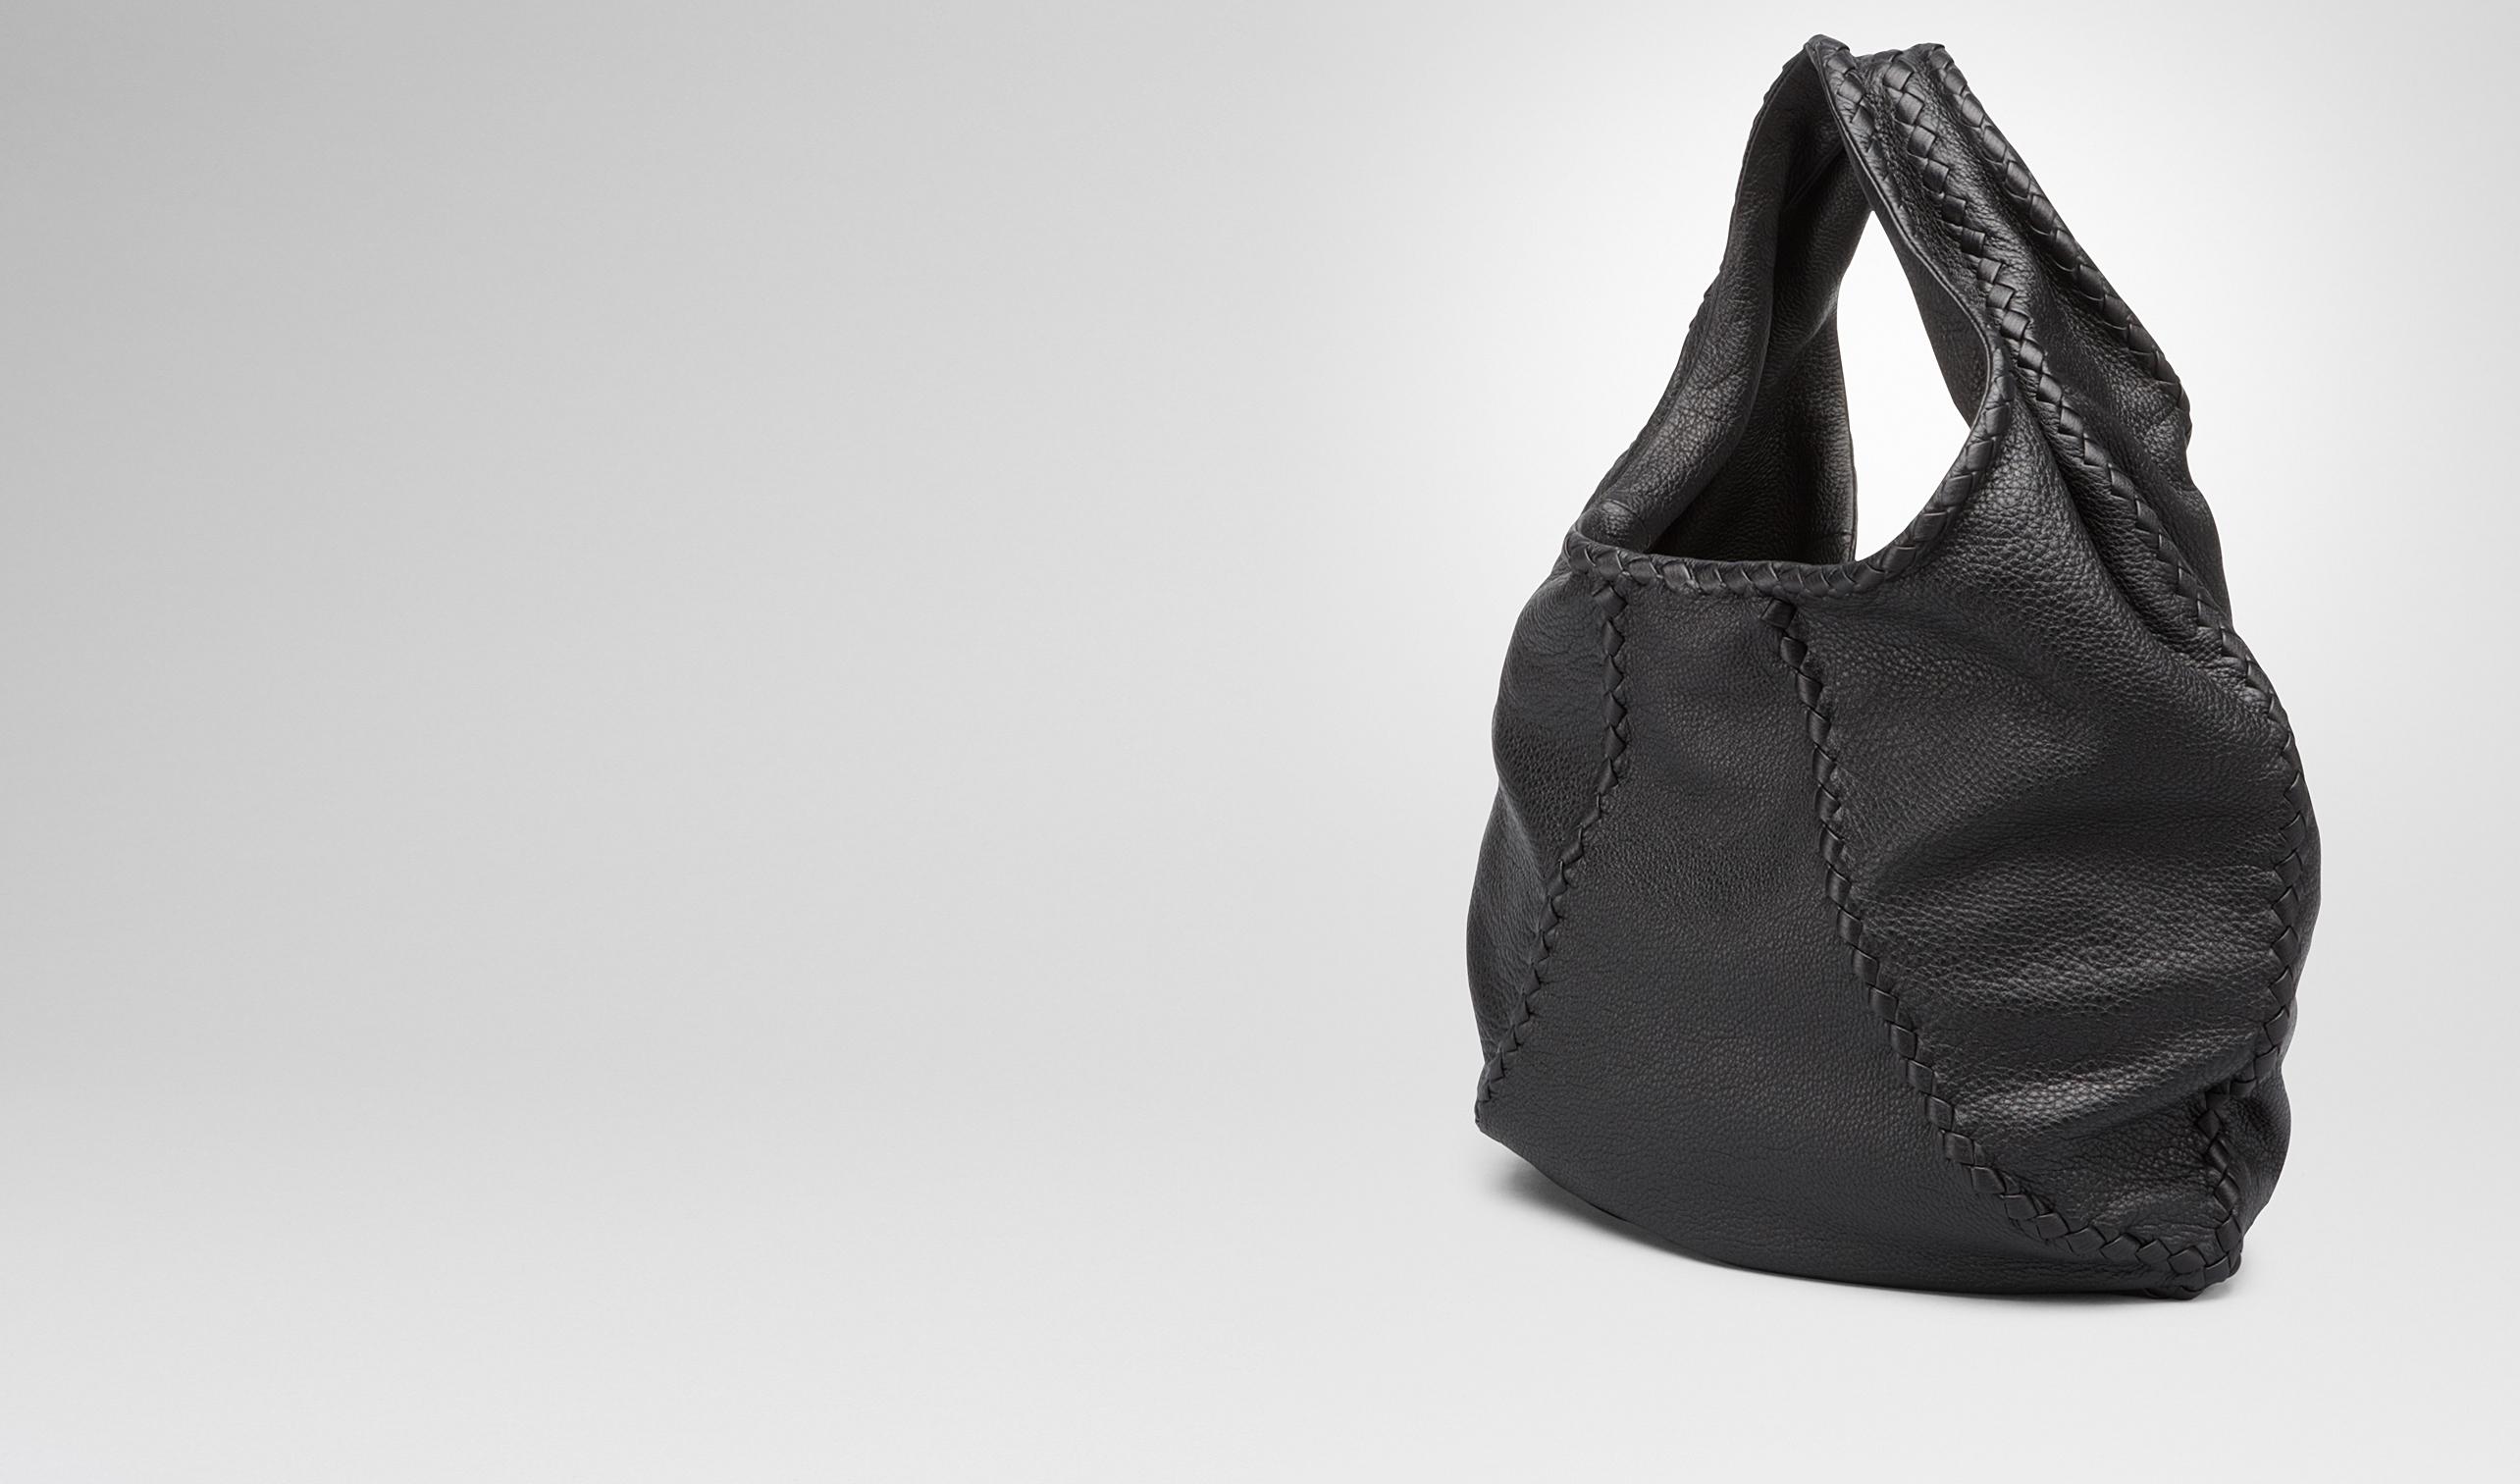 7748a94a76 Bottega Veneta® - Nero Washed Cervo Bag